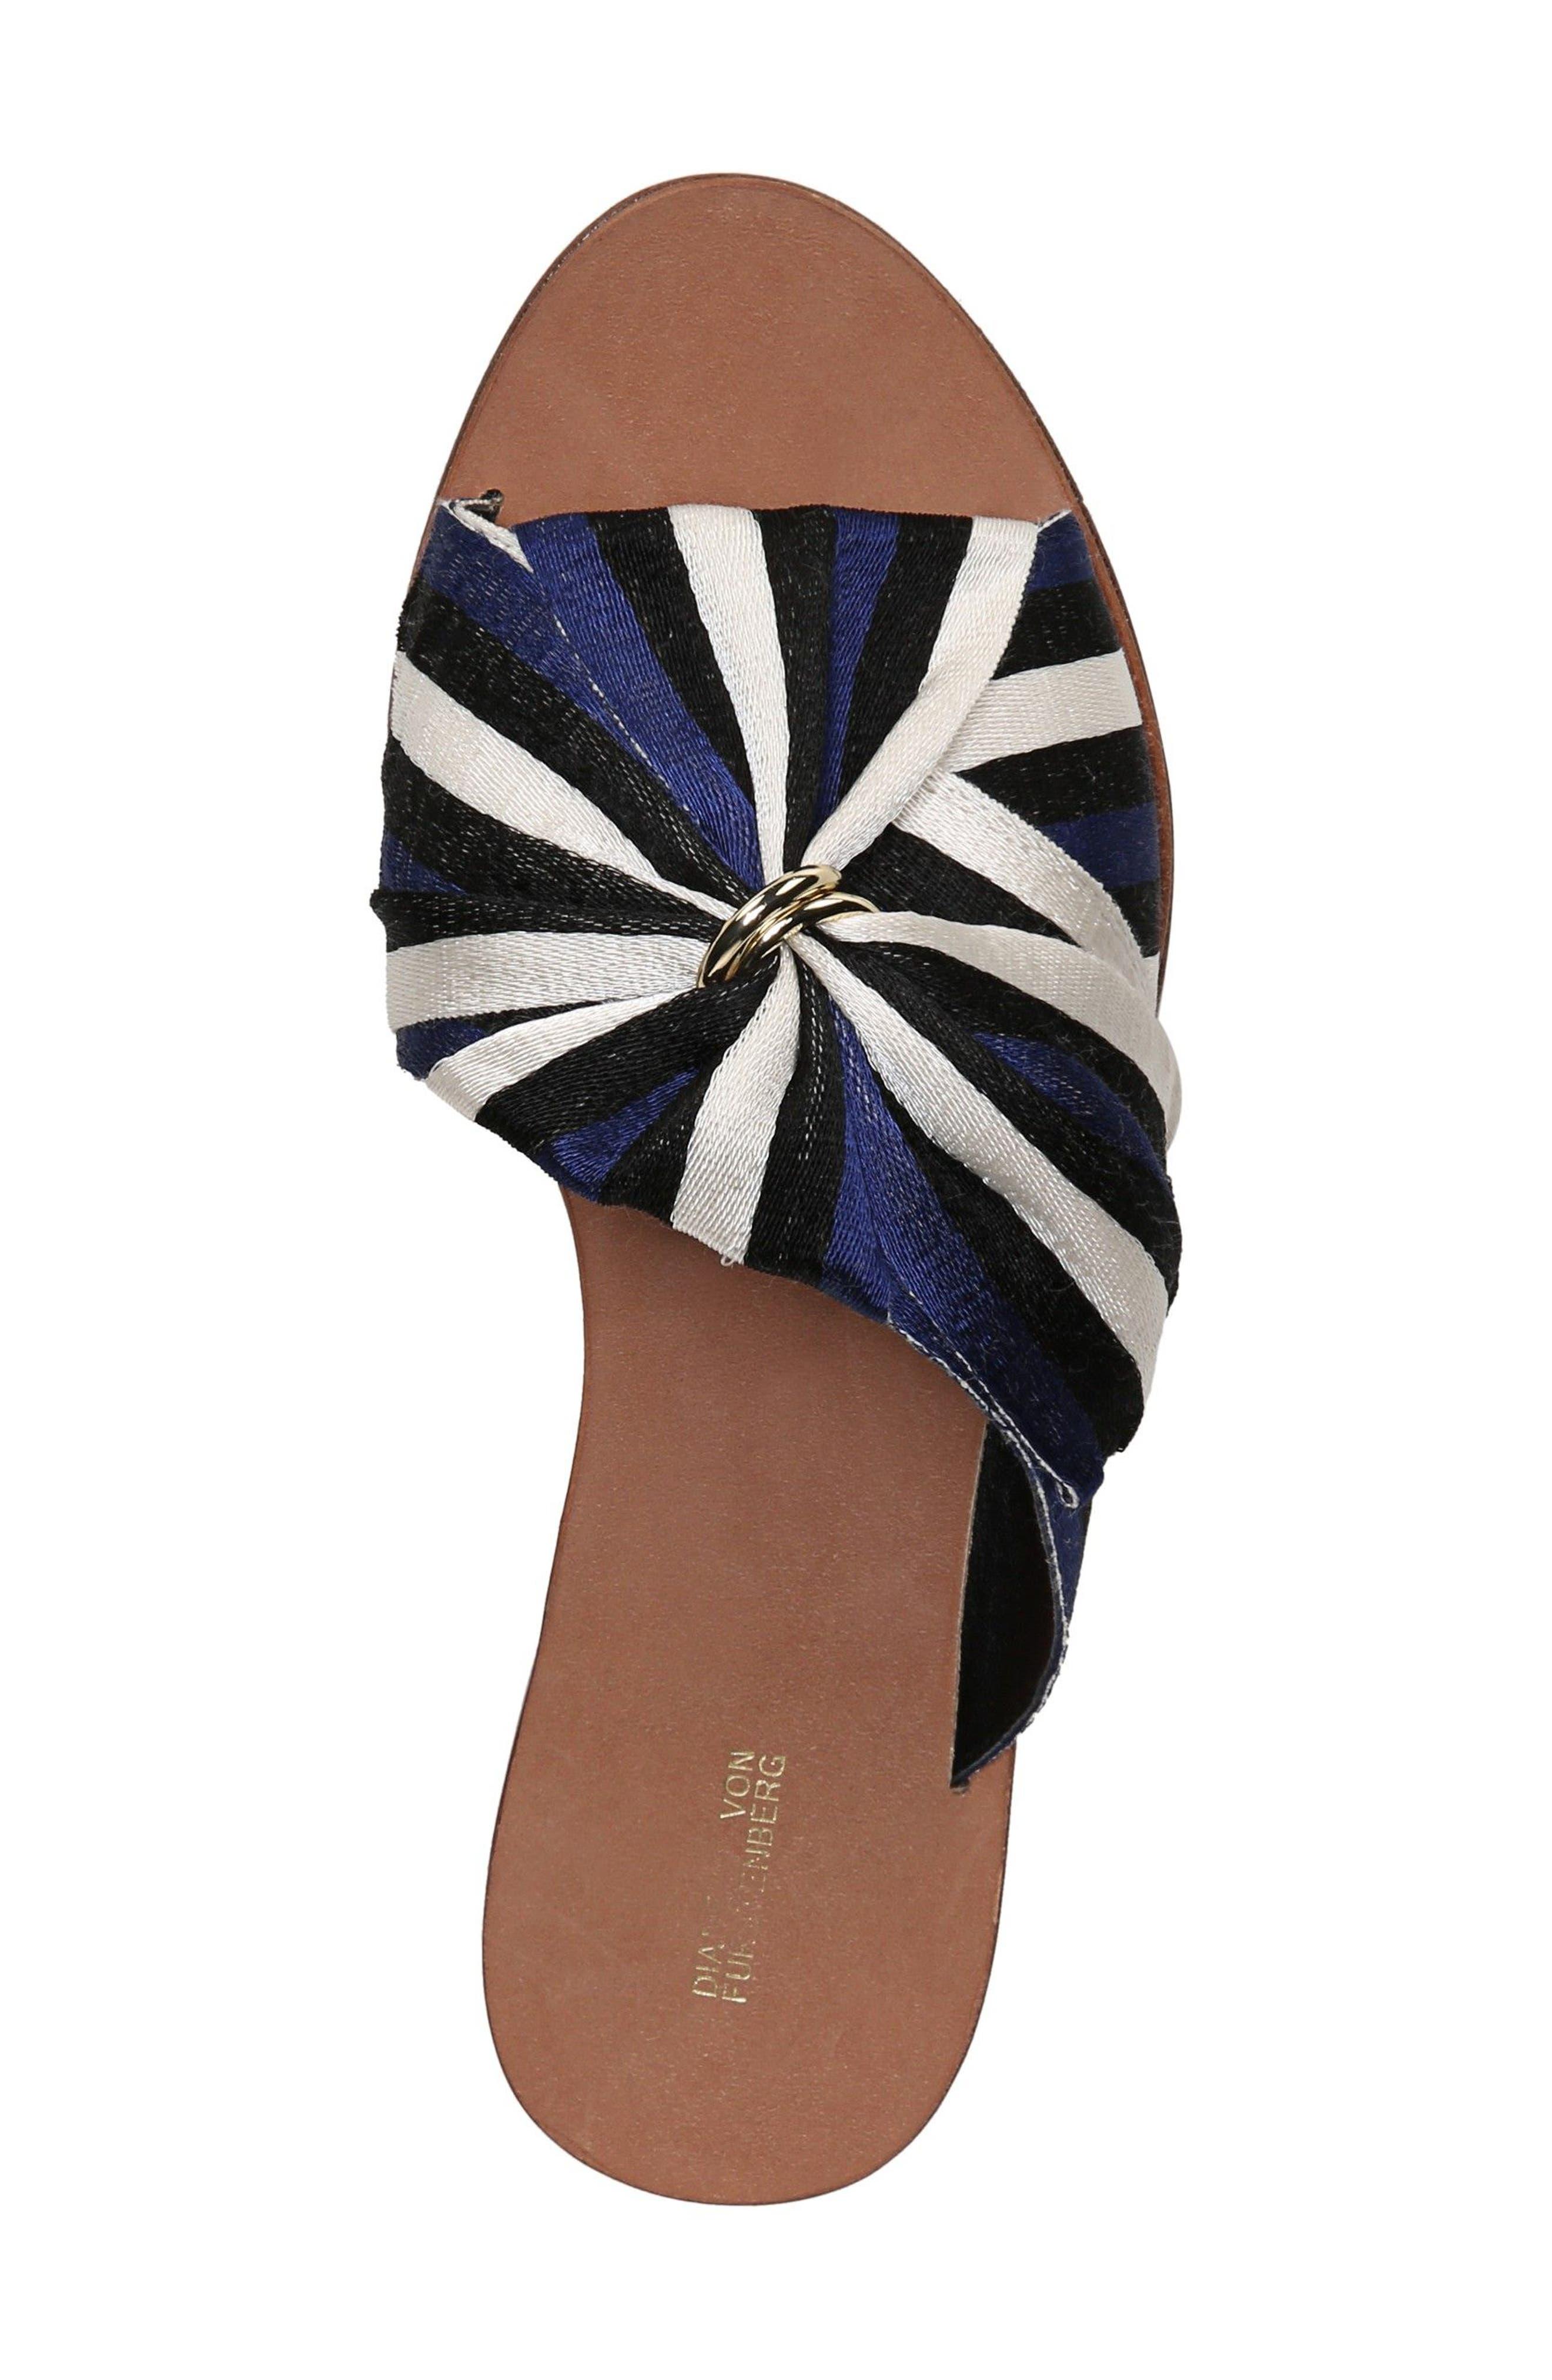 Bella Asymmetrical Slide Sandal,                             Alternate thumbnail 5, color,                             400